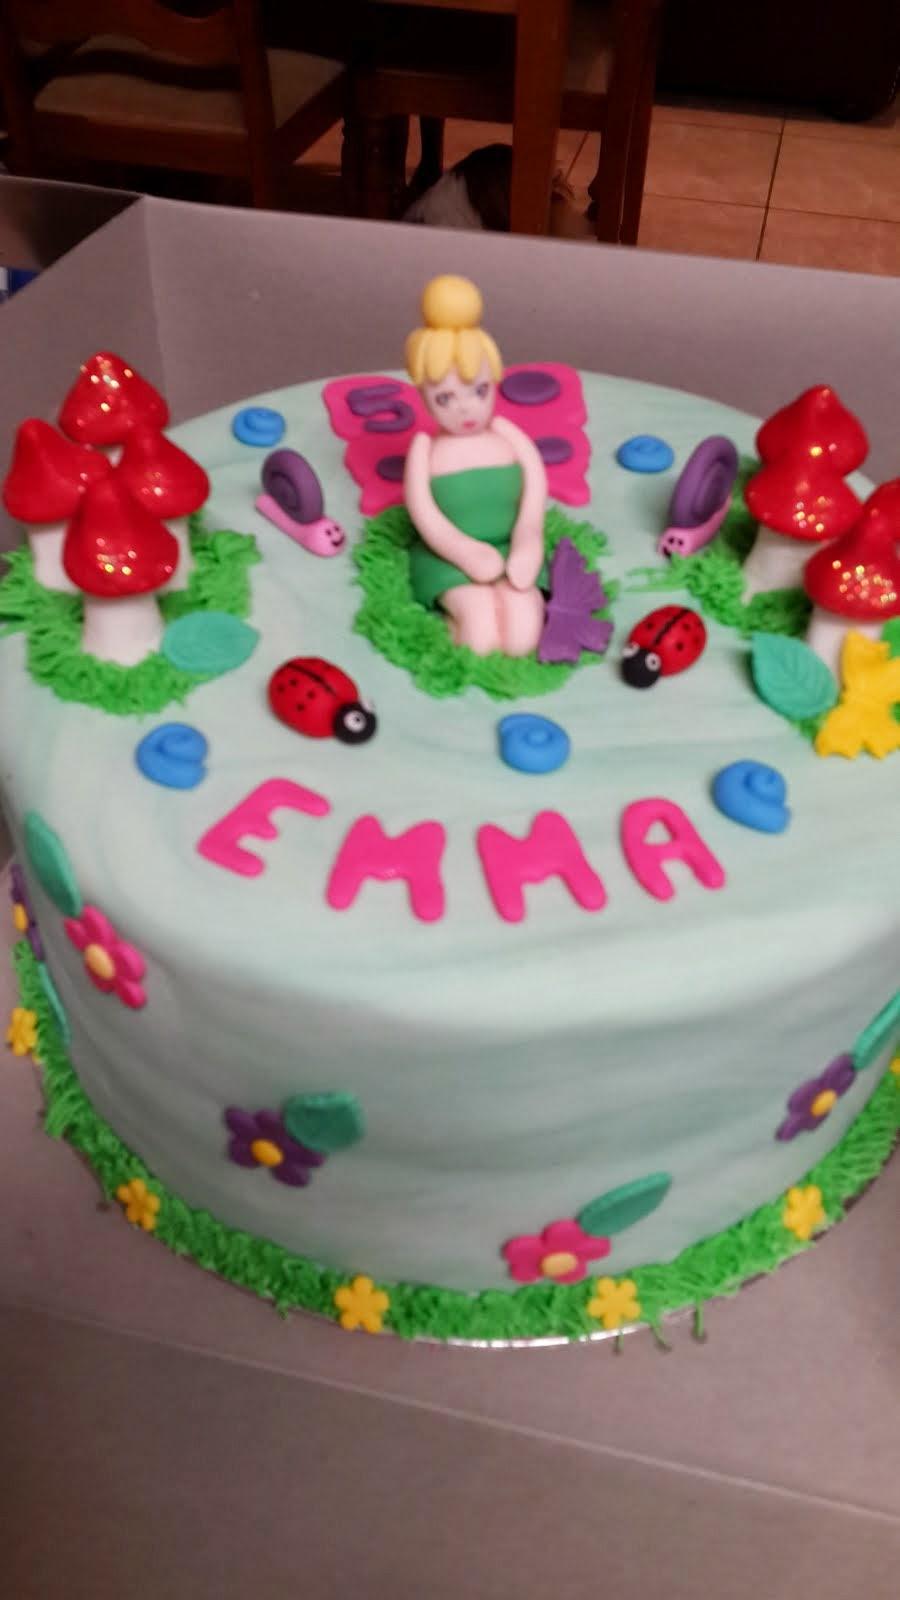 Emma's Tinkerbell Cake